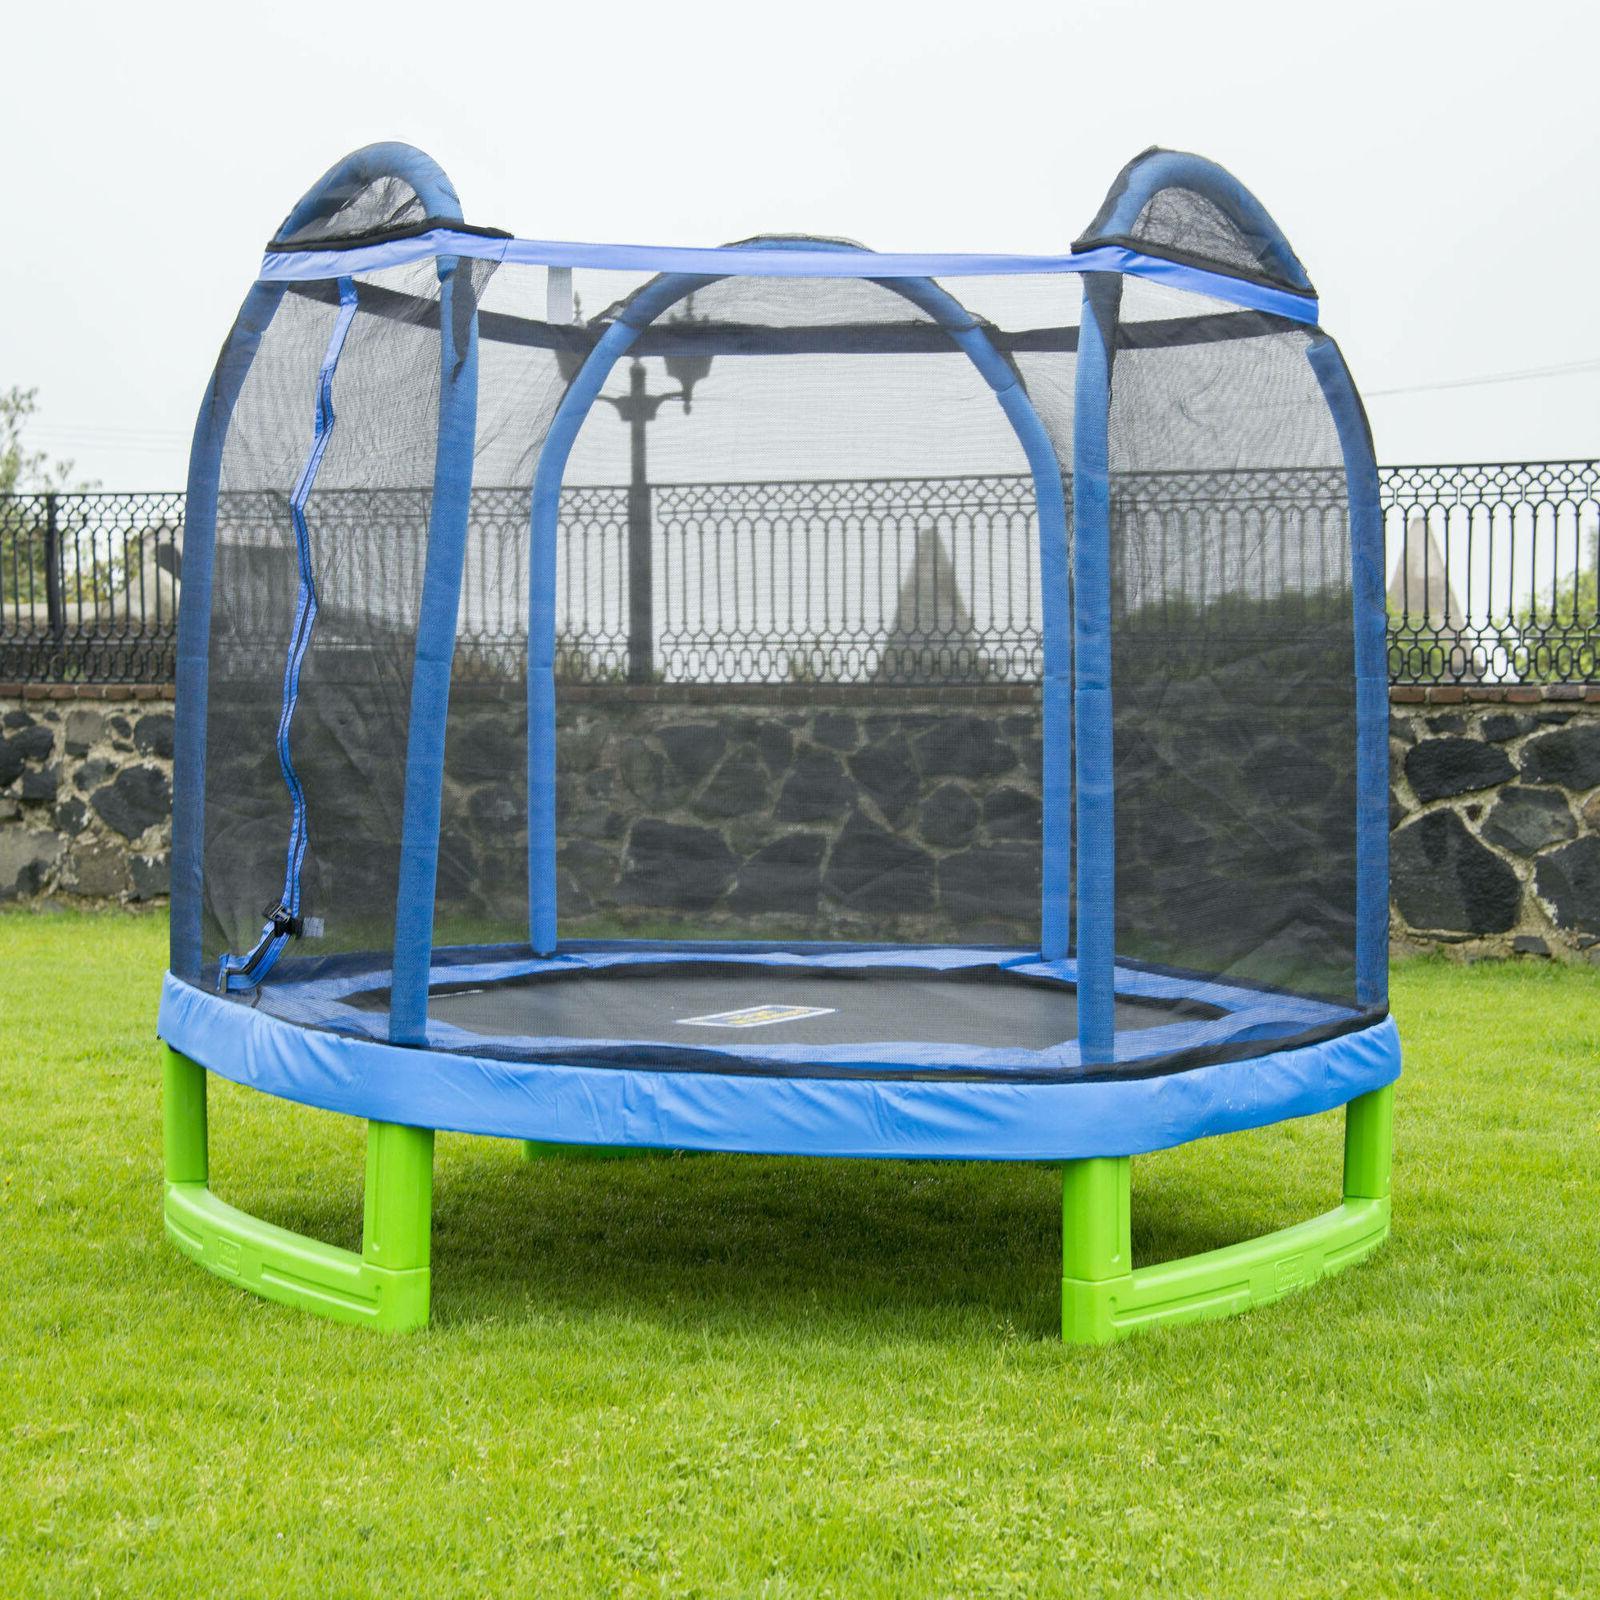 Bounce Pro 7-Foot My First Trampoline Hexagon  for Kids, Blu